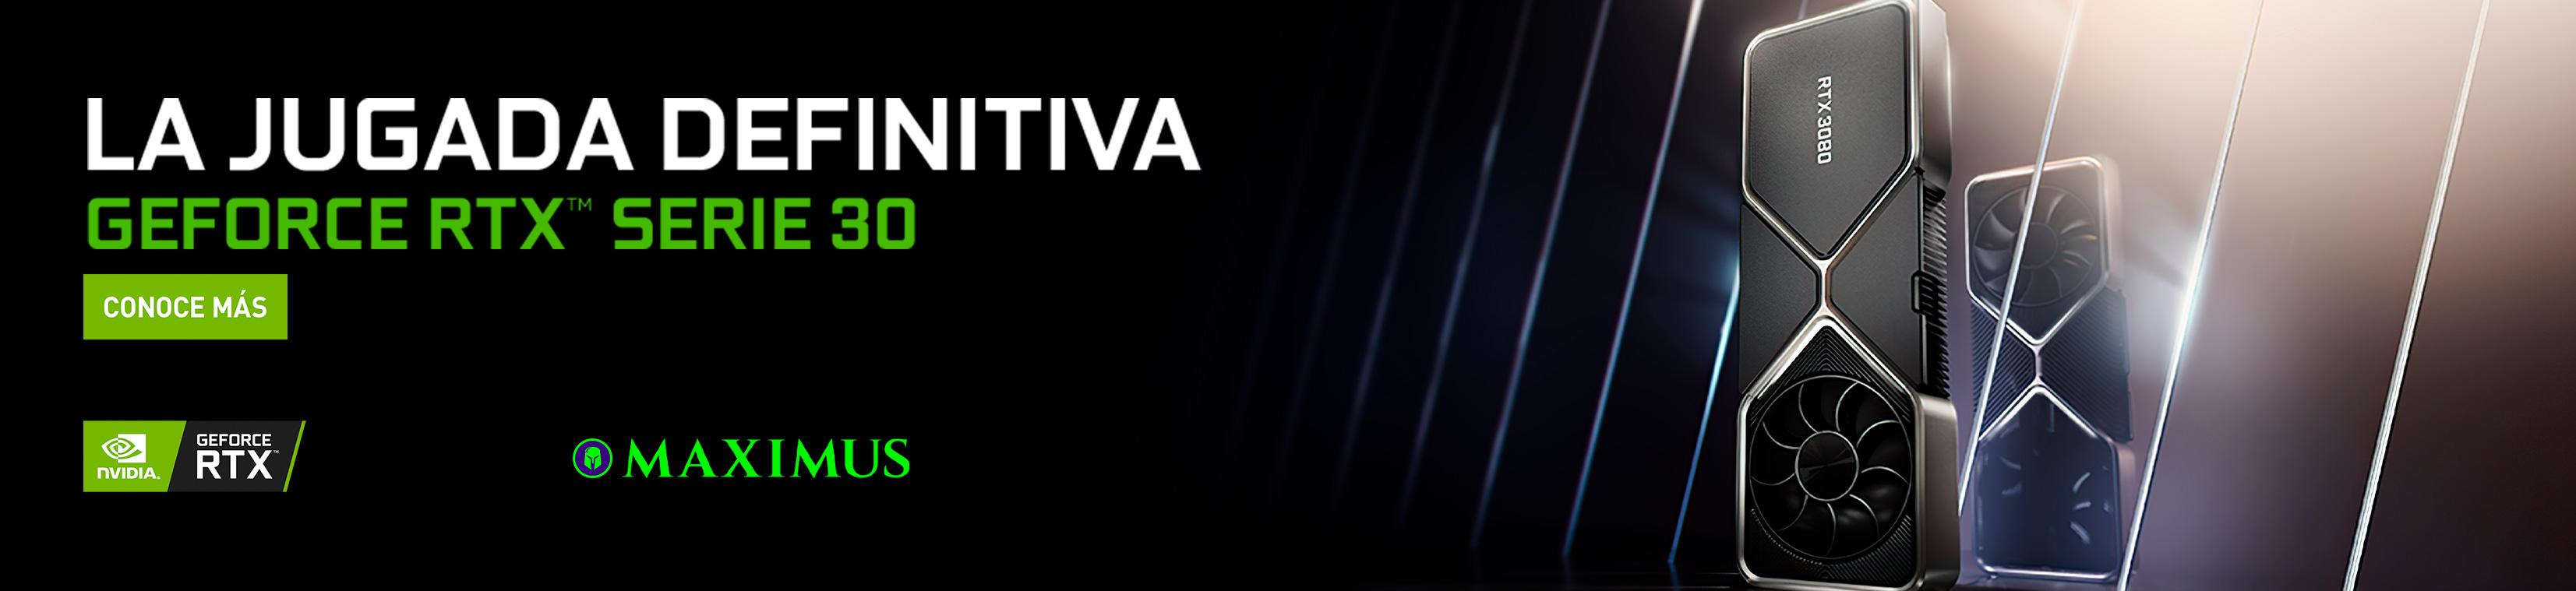 series-30-nvidia2